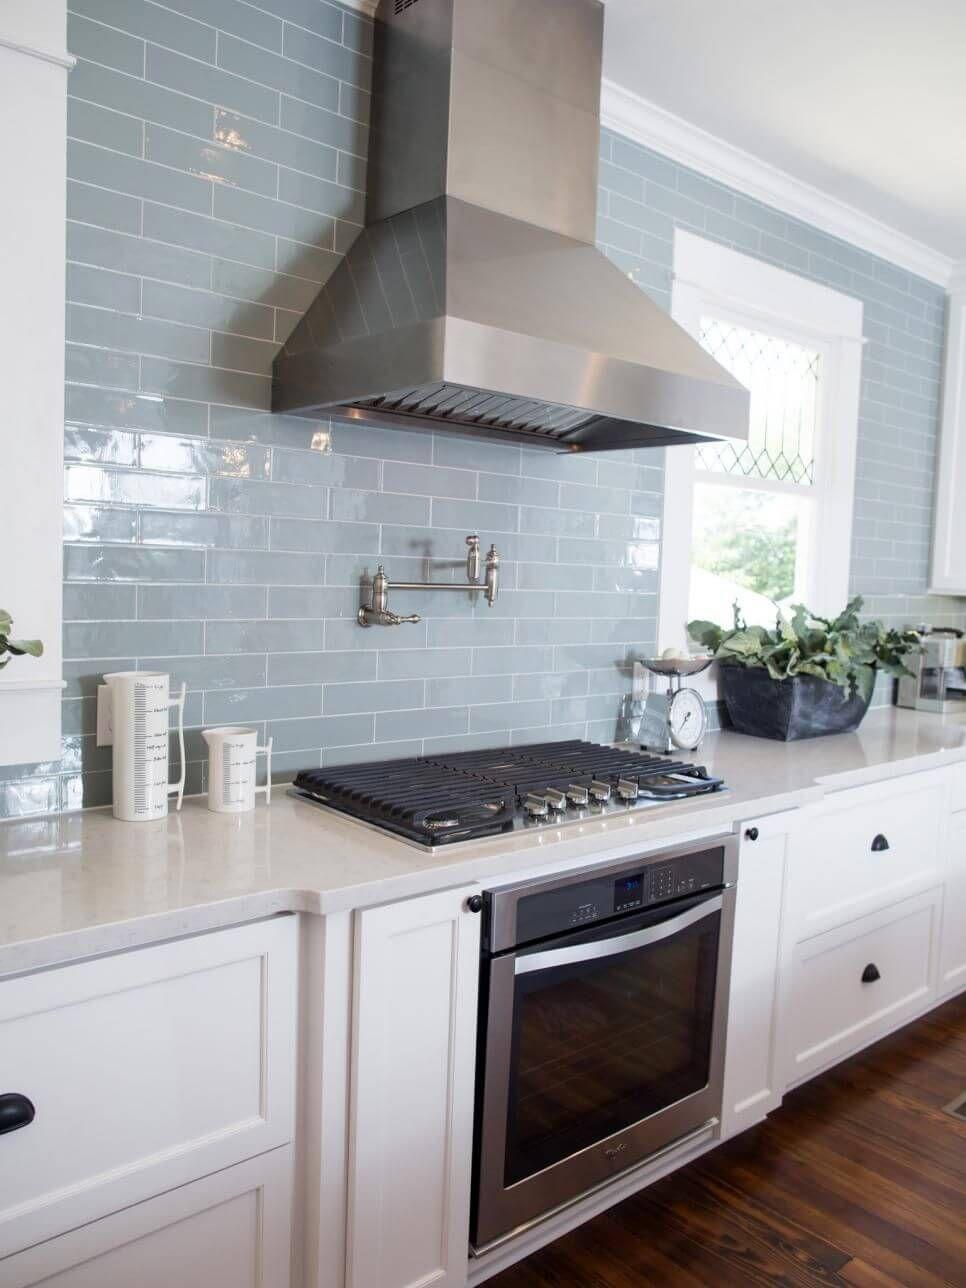 10 Subway Tile Kitchen Backsplash Ideas 2021 The Classic Kitchen Backsplash Trends Backsplash Trends Grey Kitchen Designs